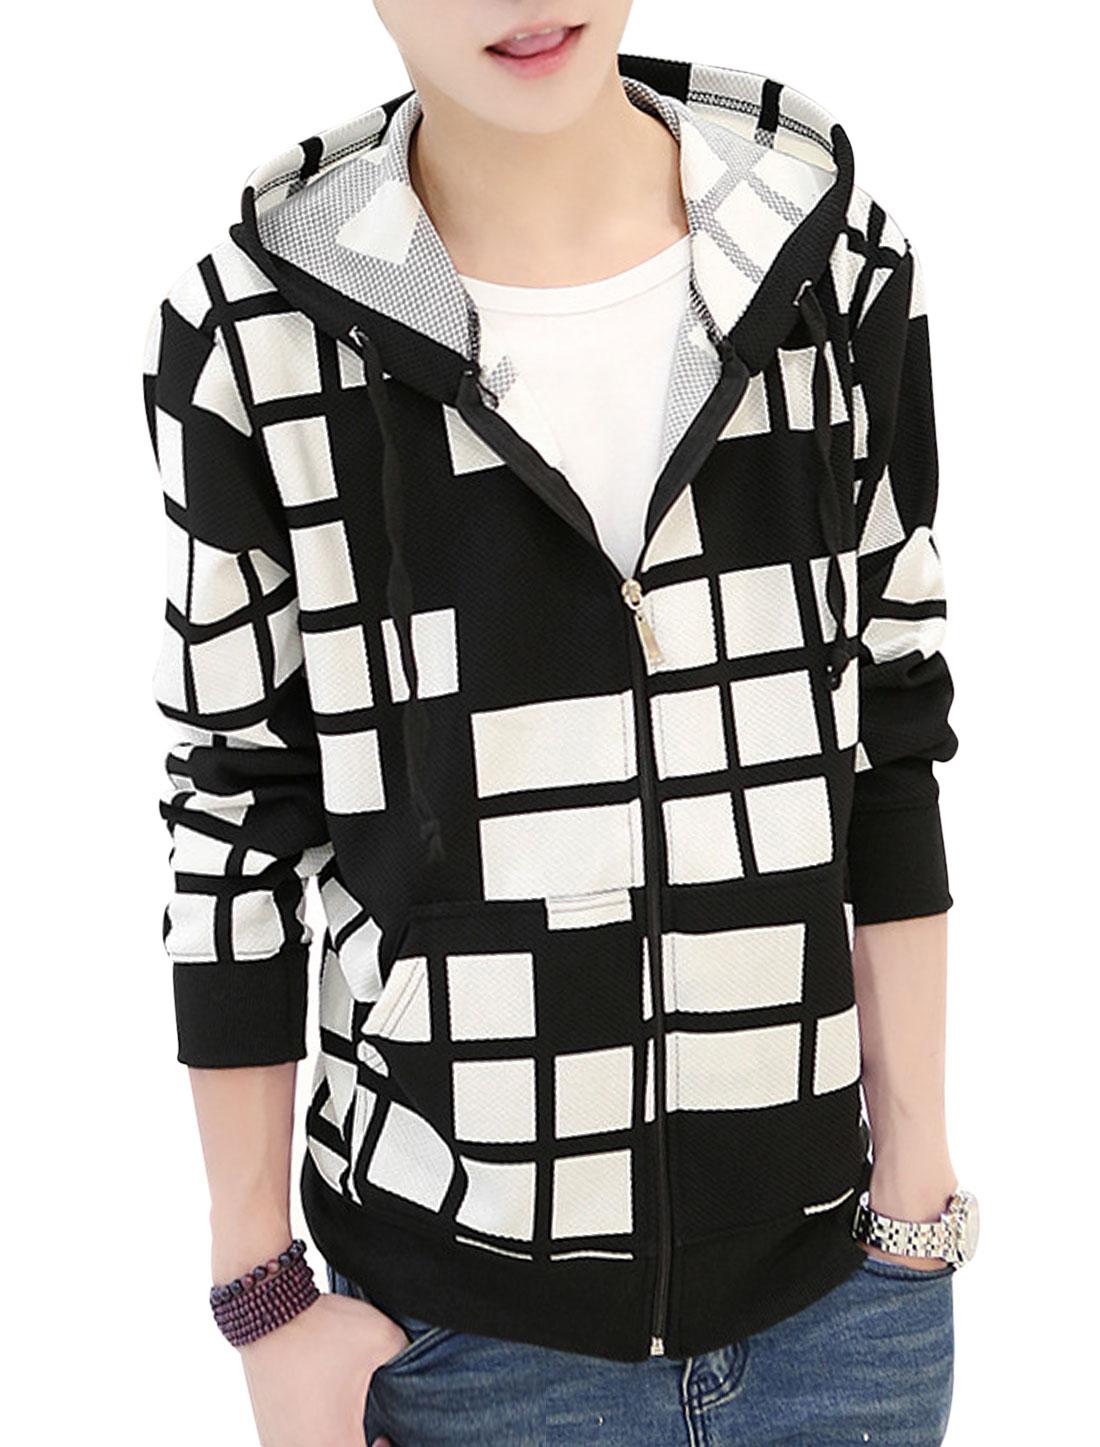 Men Drawstring Hooded Zip Up Plaids Pattern Casual Hoodie Jacket Black White S